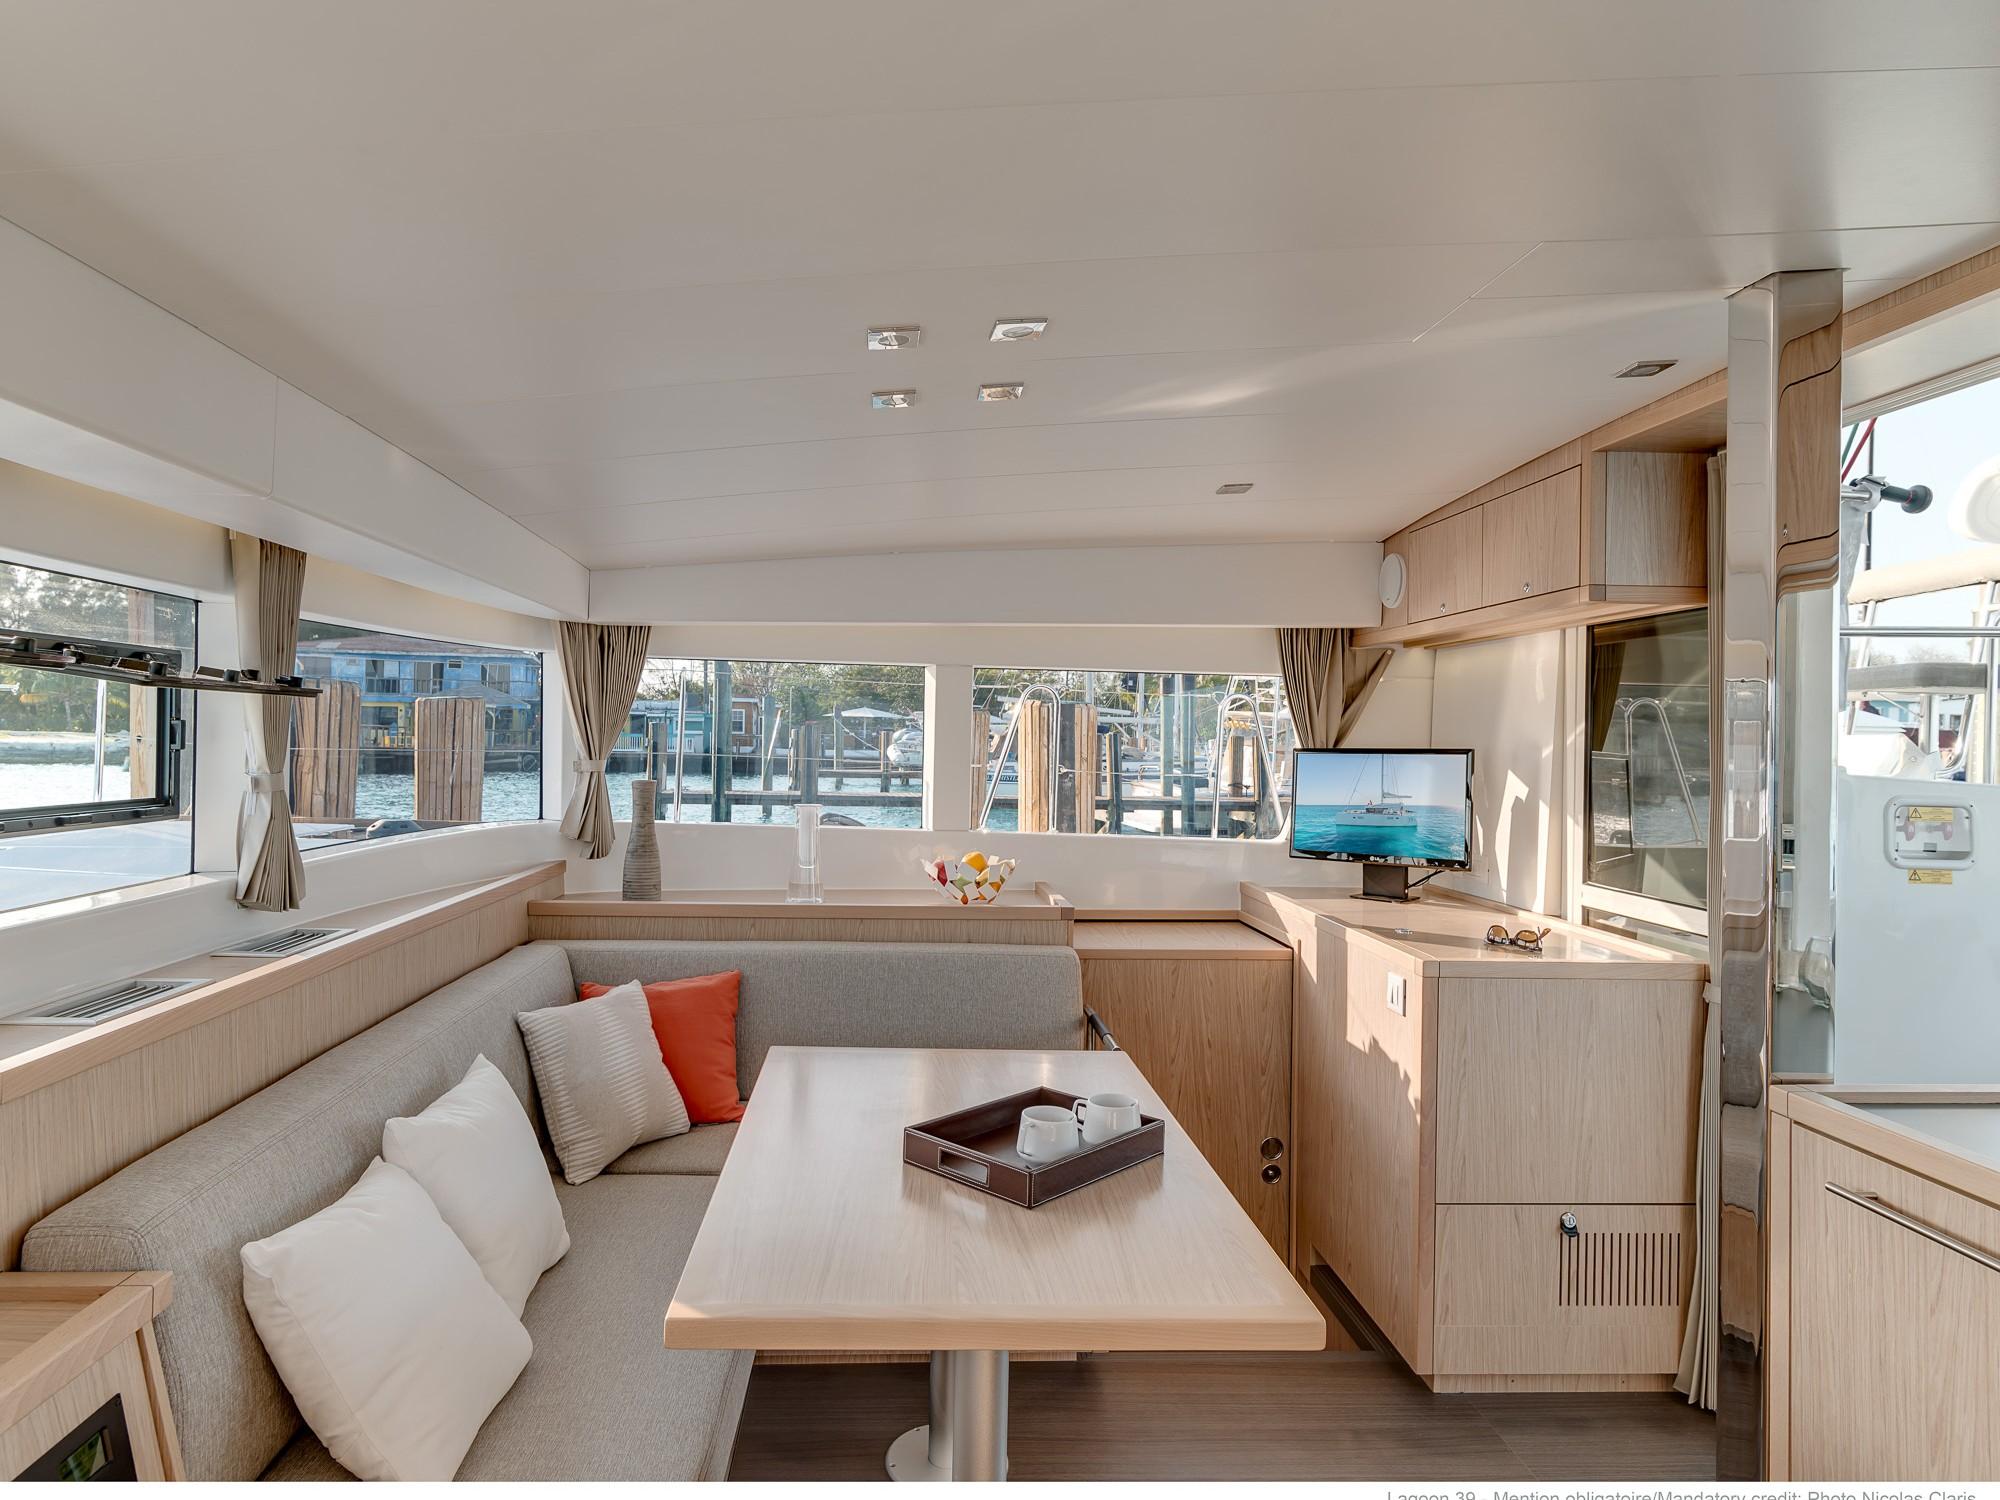 Catamaran - Lagoon 39 - 4 Cabins - Built 2017